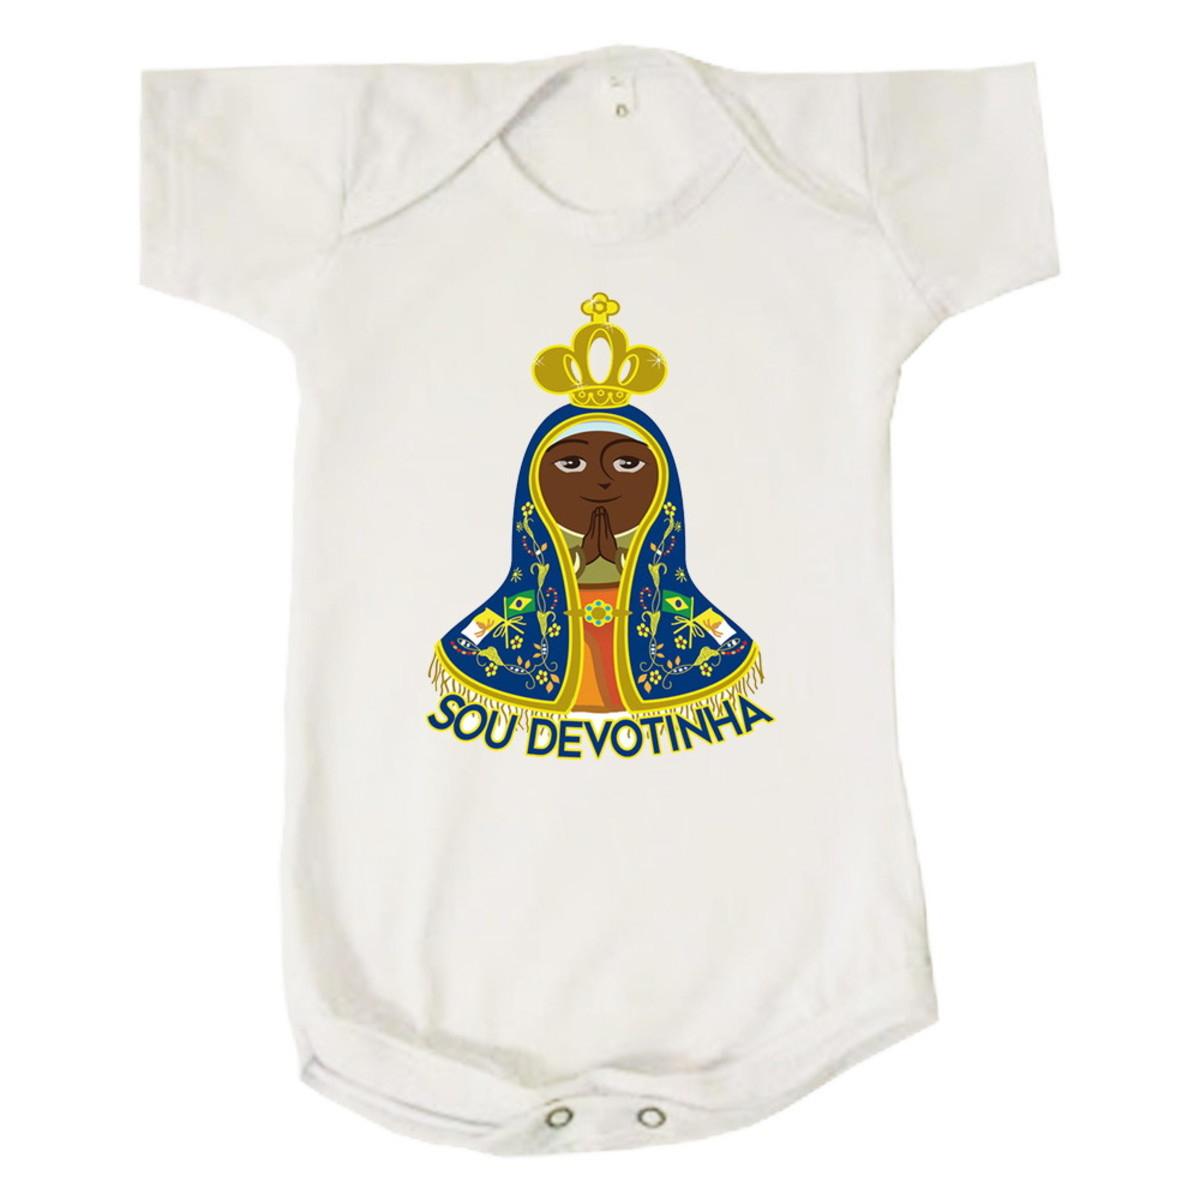 c0c461bb6f69 Body Bebê Nossa Senhora Sou Devotinha no Elo7   Loja Print Pop (6B276C)